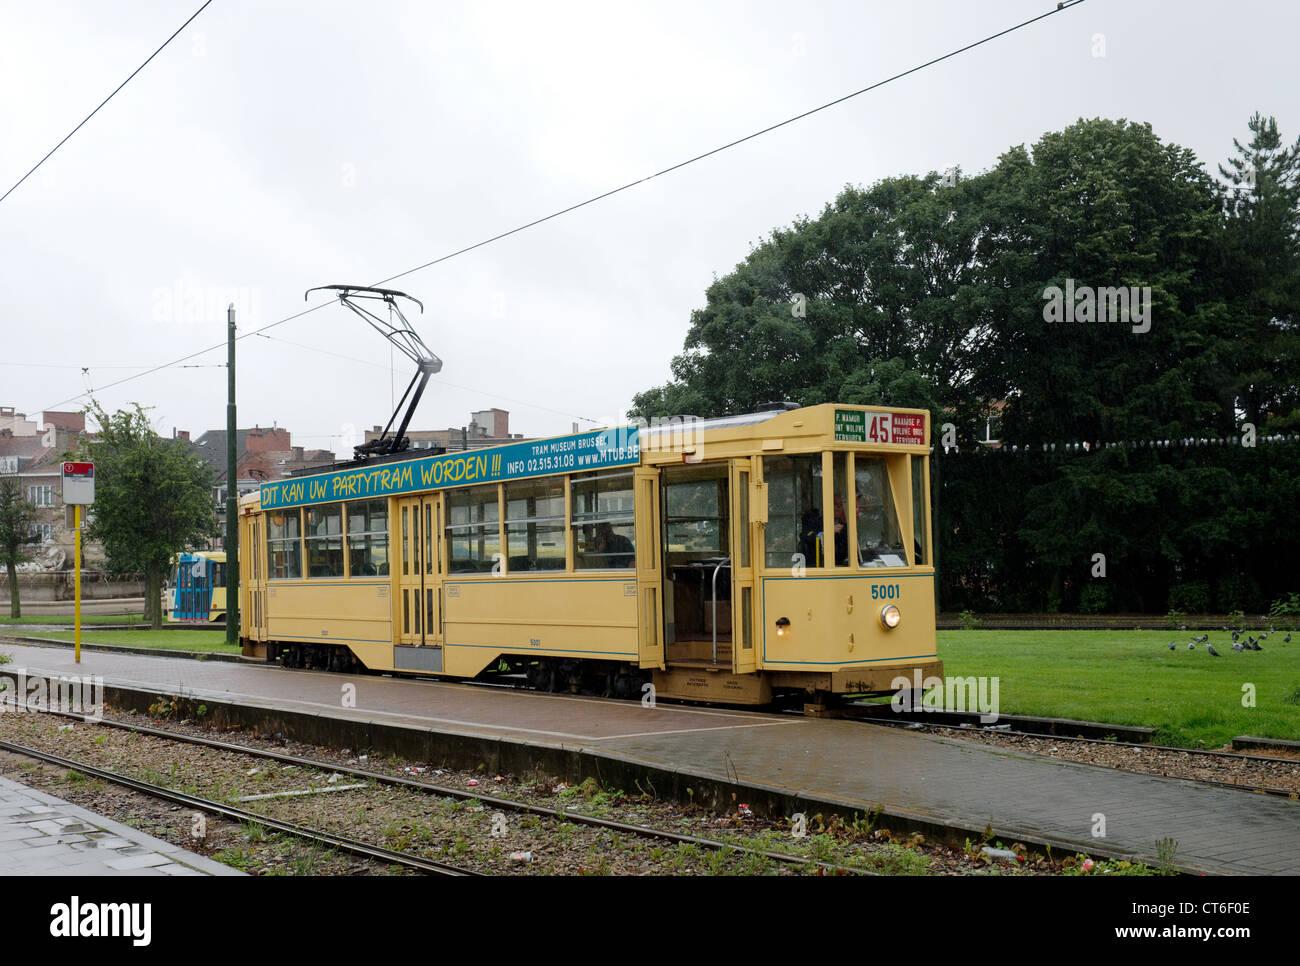 Brussels Vintage Tram No.5001 at Stadion Terminus -1 - Stock Image